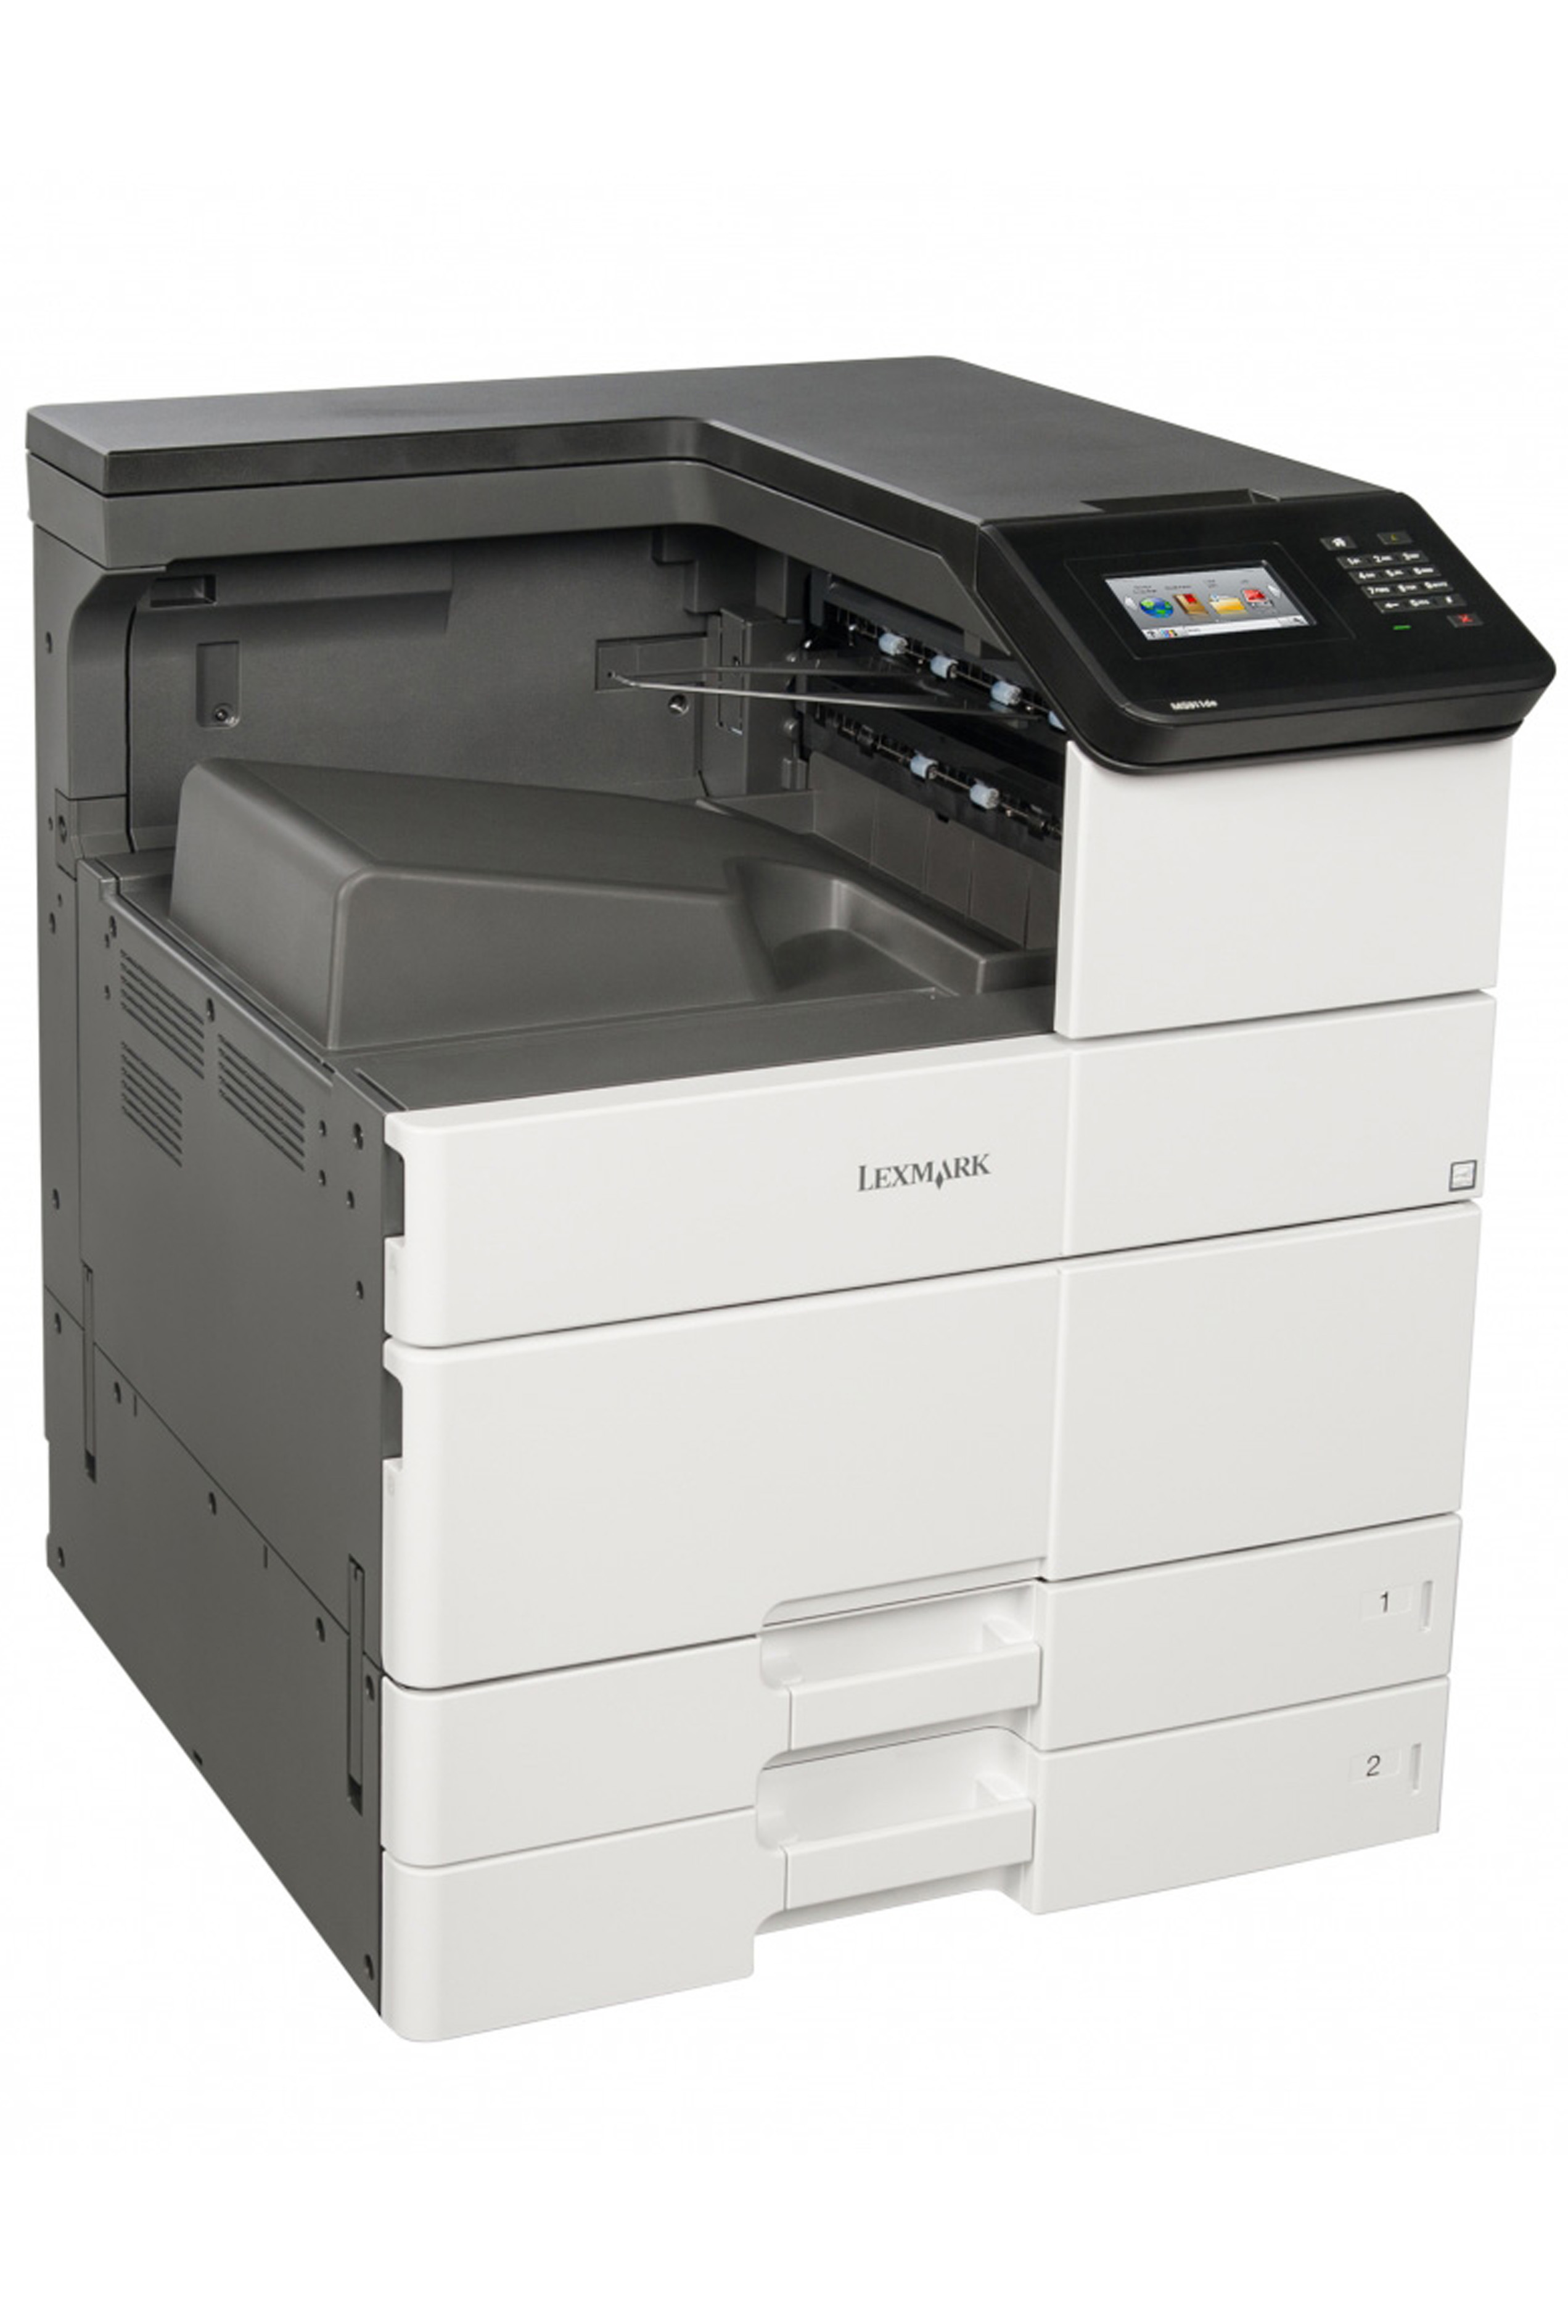 Lexmark MS911DE Laser Printer...